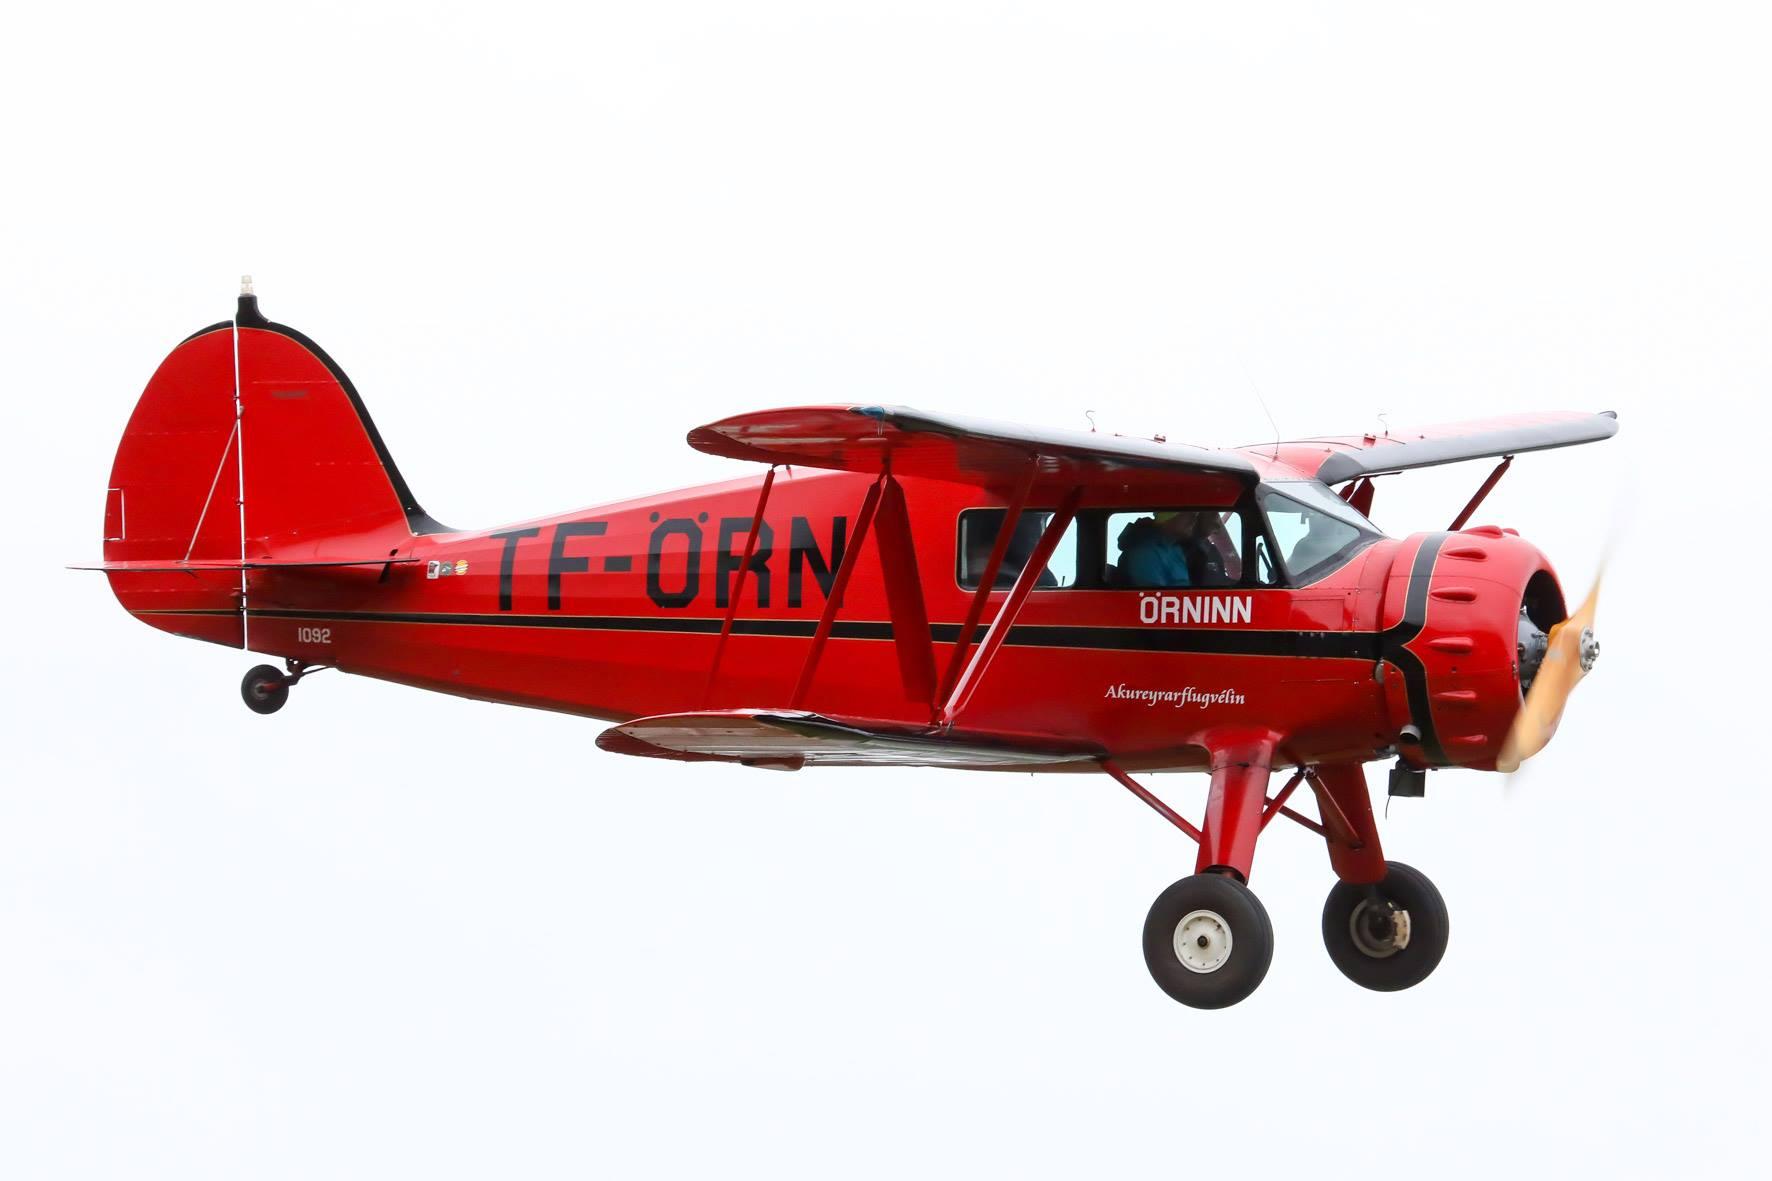 Waco YKS-7 reg. TF-ÖRN, piloted by Krstján Þór Kristjánsson, was very popular air transport in Iceland in 1930s // Source: Hörður Geirsson